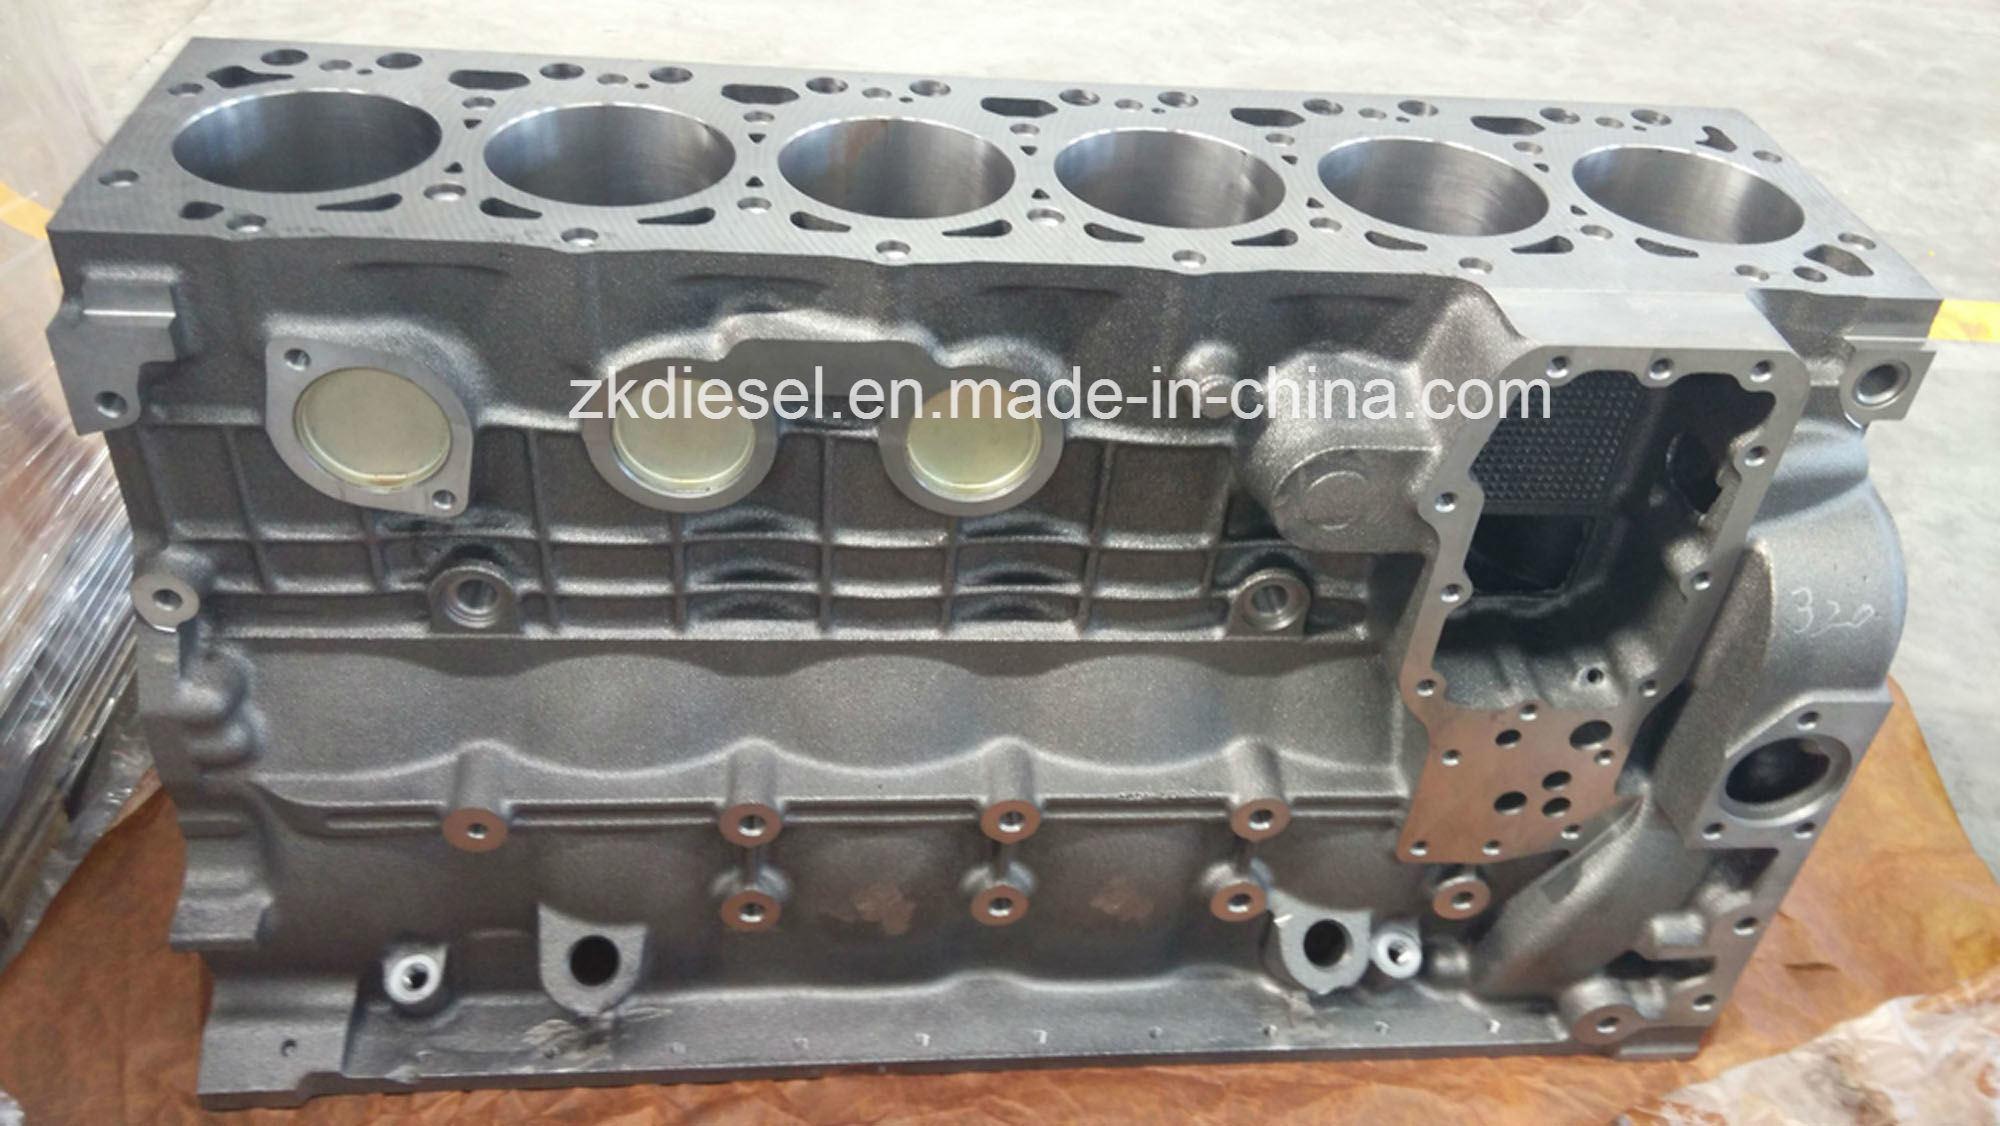 Factory Supply Cummins Isb5.9 Diesel Engine Cylinder Block with Original Casting 4897335/4089119/3971683/4897326/4025230/4025229/3963351/3979008